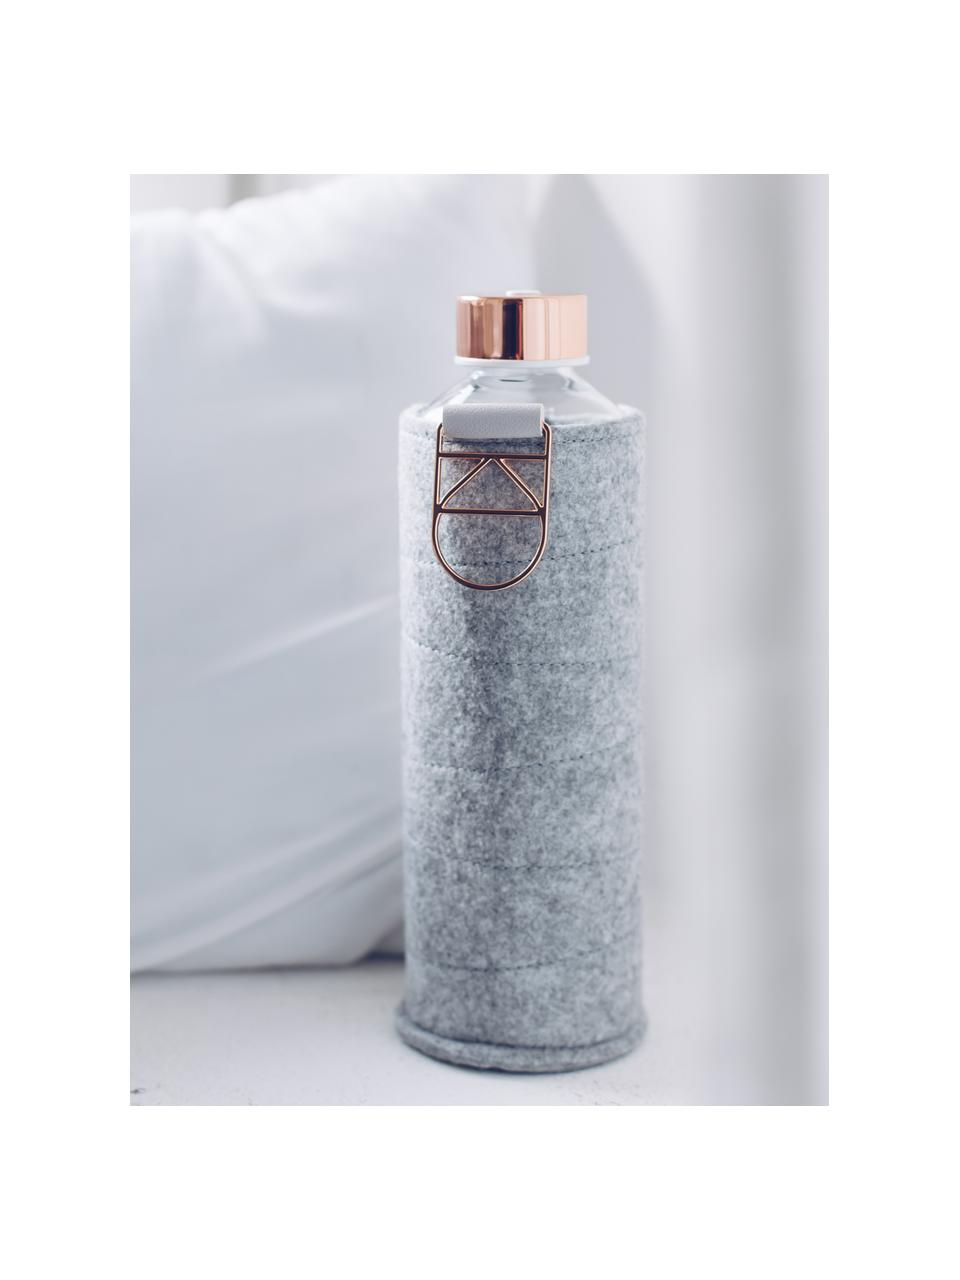 Trinkflasche Mismatch, Flasche: Borosilikatglas, Deckel: Edelstahl, Tritan, Siliko, Bezug: Polyesterfilz, Grau, Transparent, Kupferfarben, Ø 8 x H 26 cm